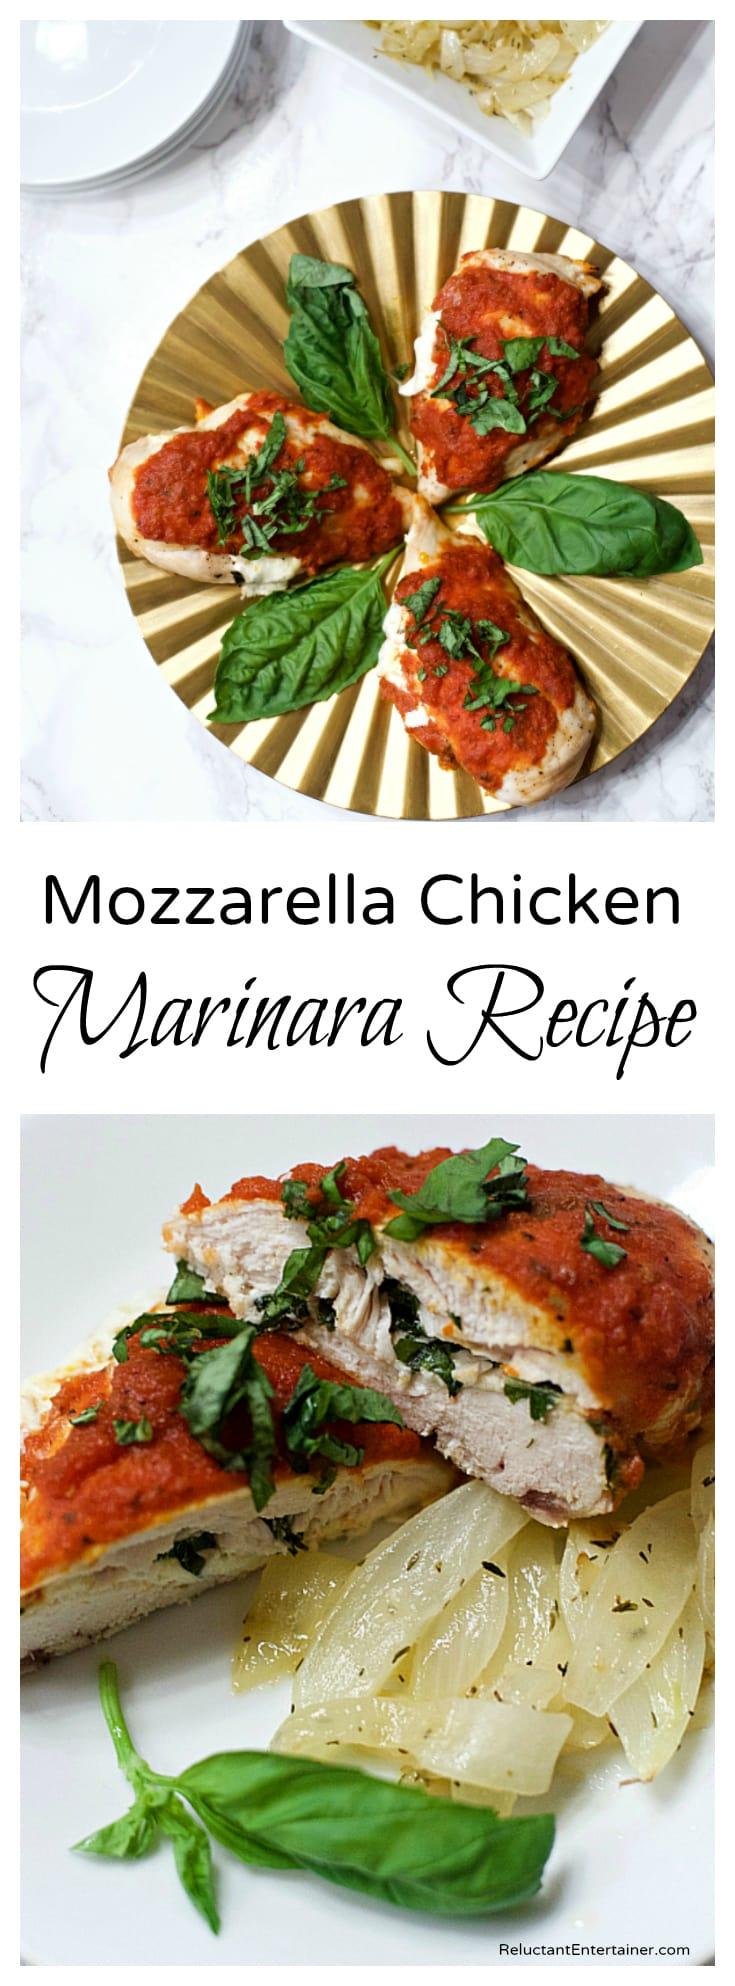 Mozzarella Chicken Marinara Recipe